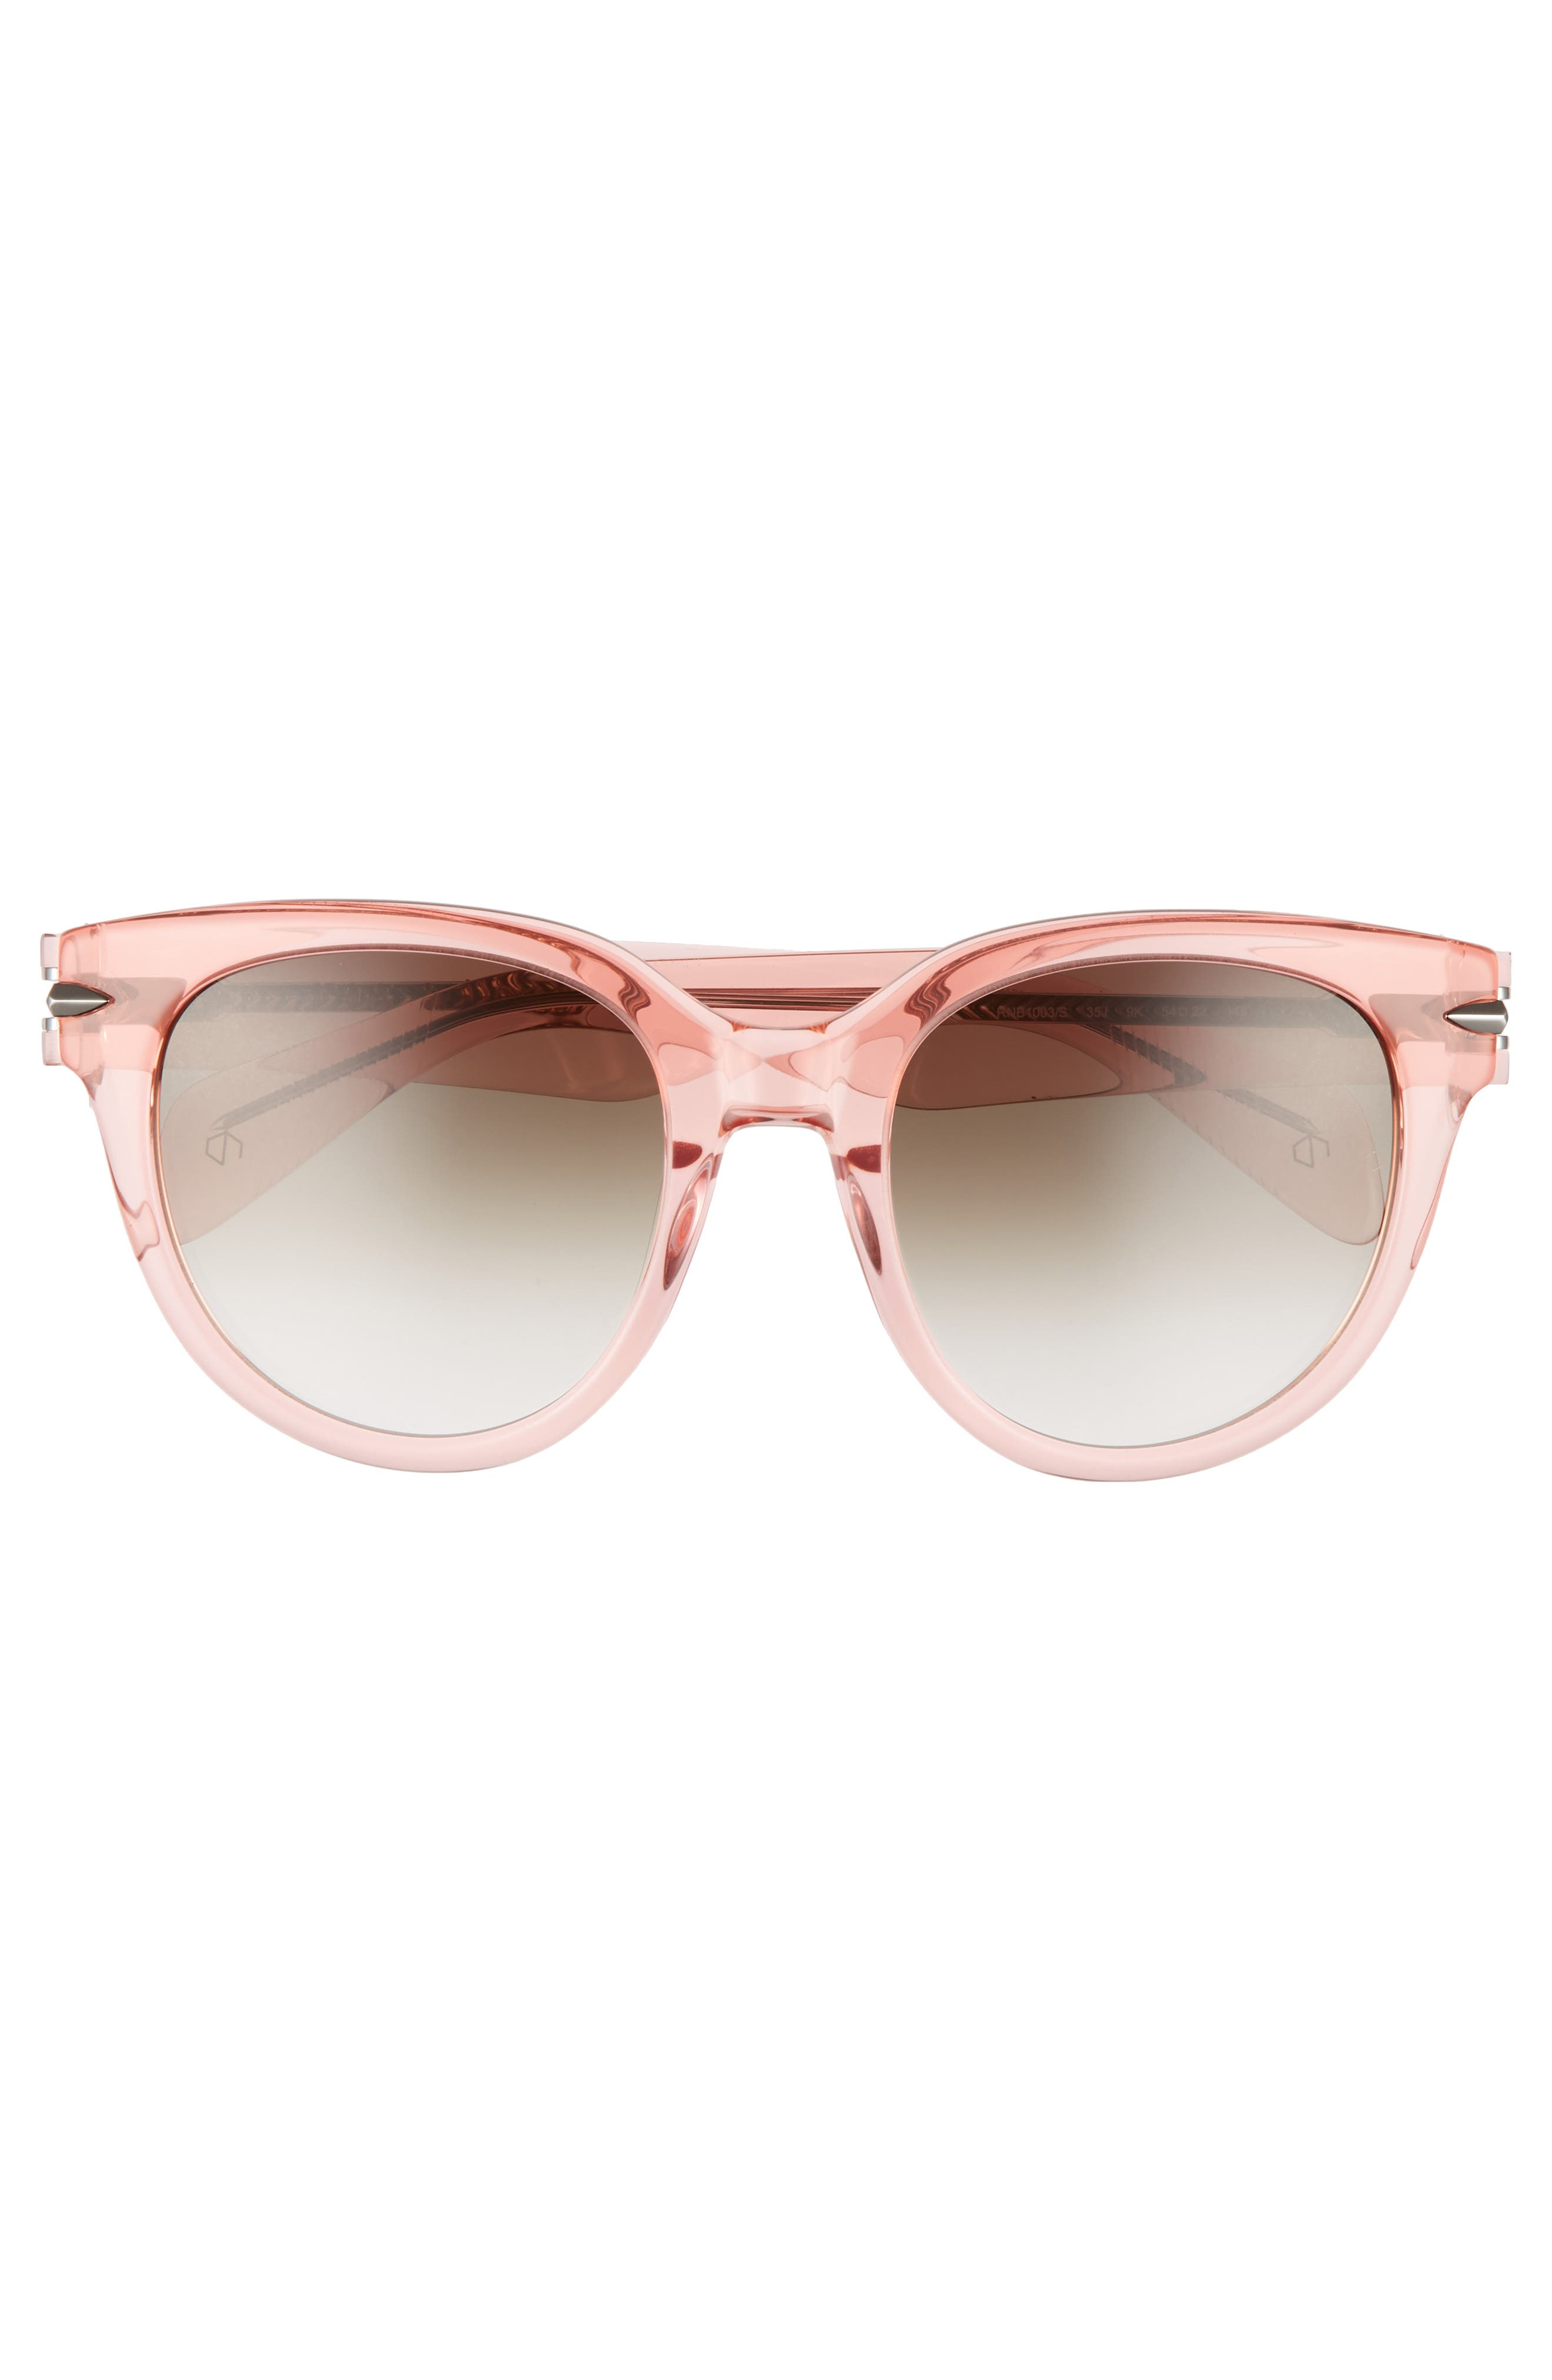 54mm Cat Eye Sunglasses,                             Alternate thumbnail 3, color,                             PINK